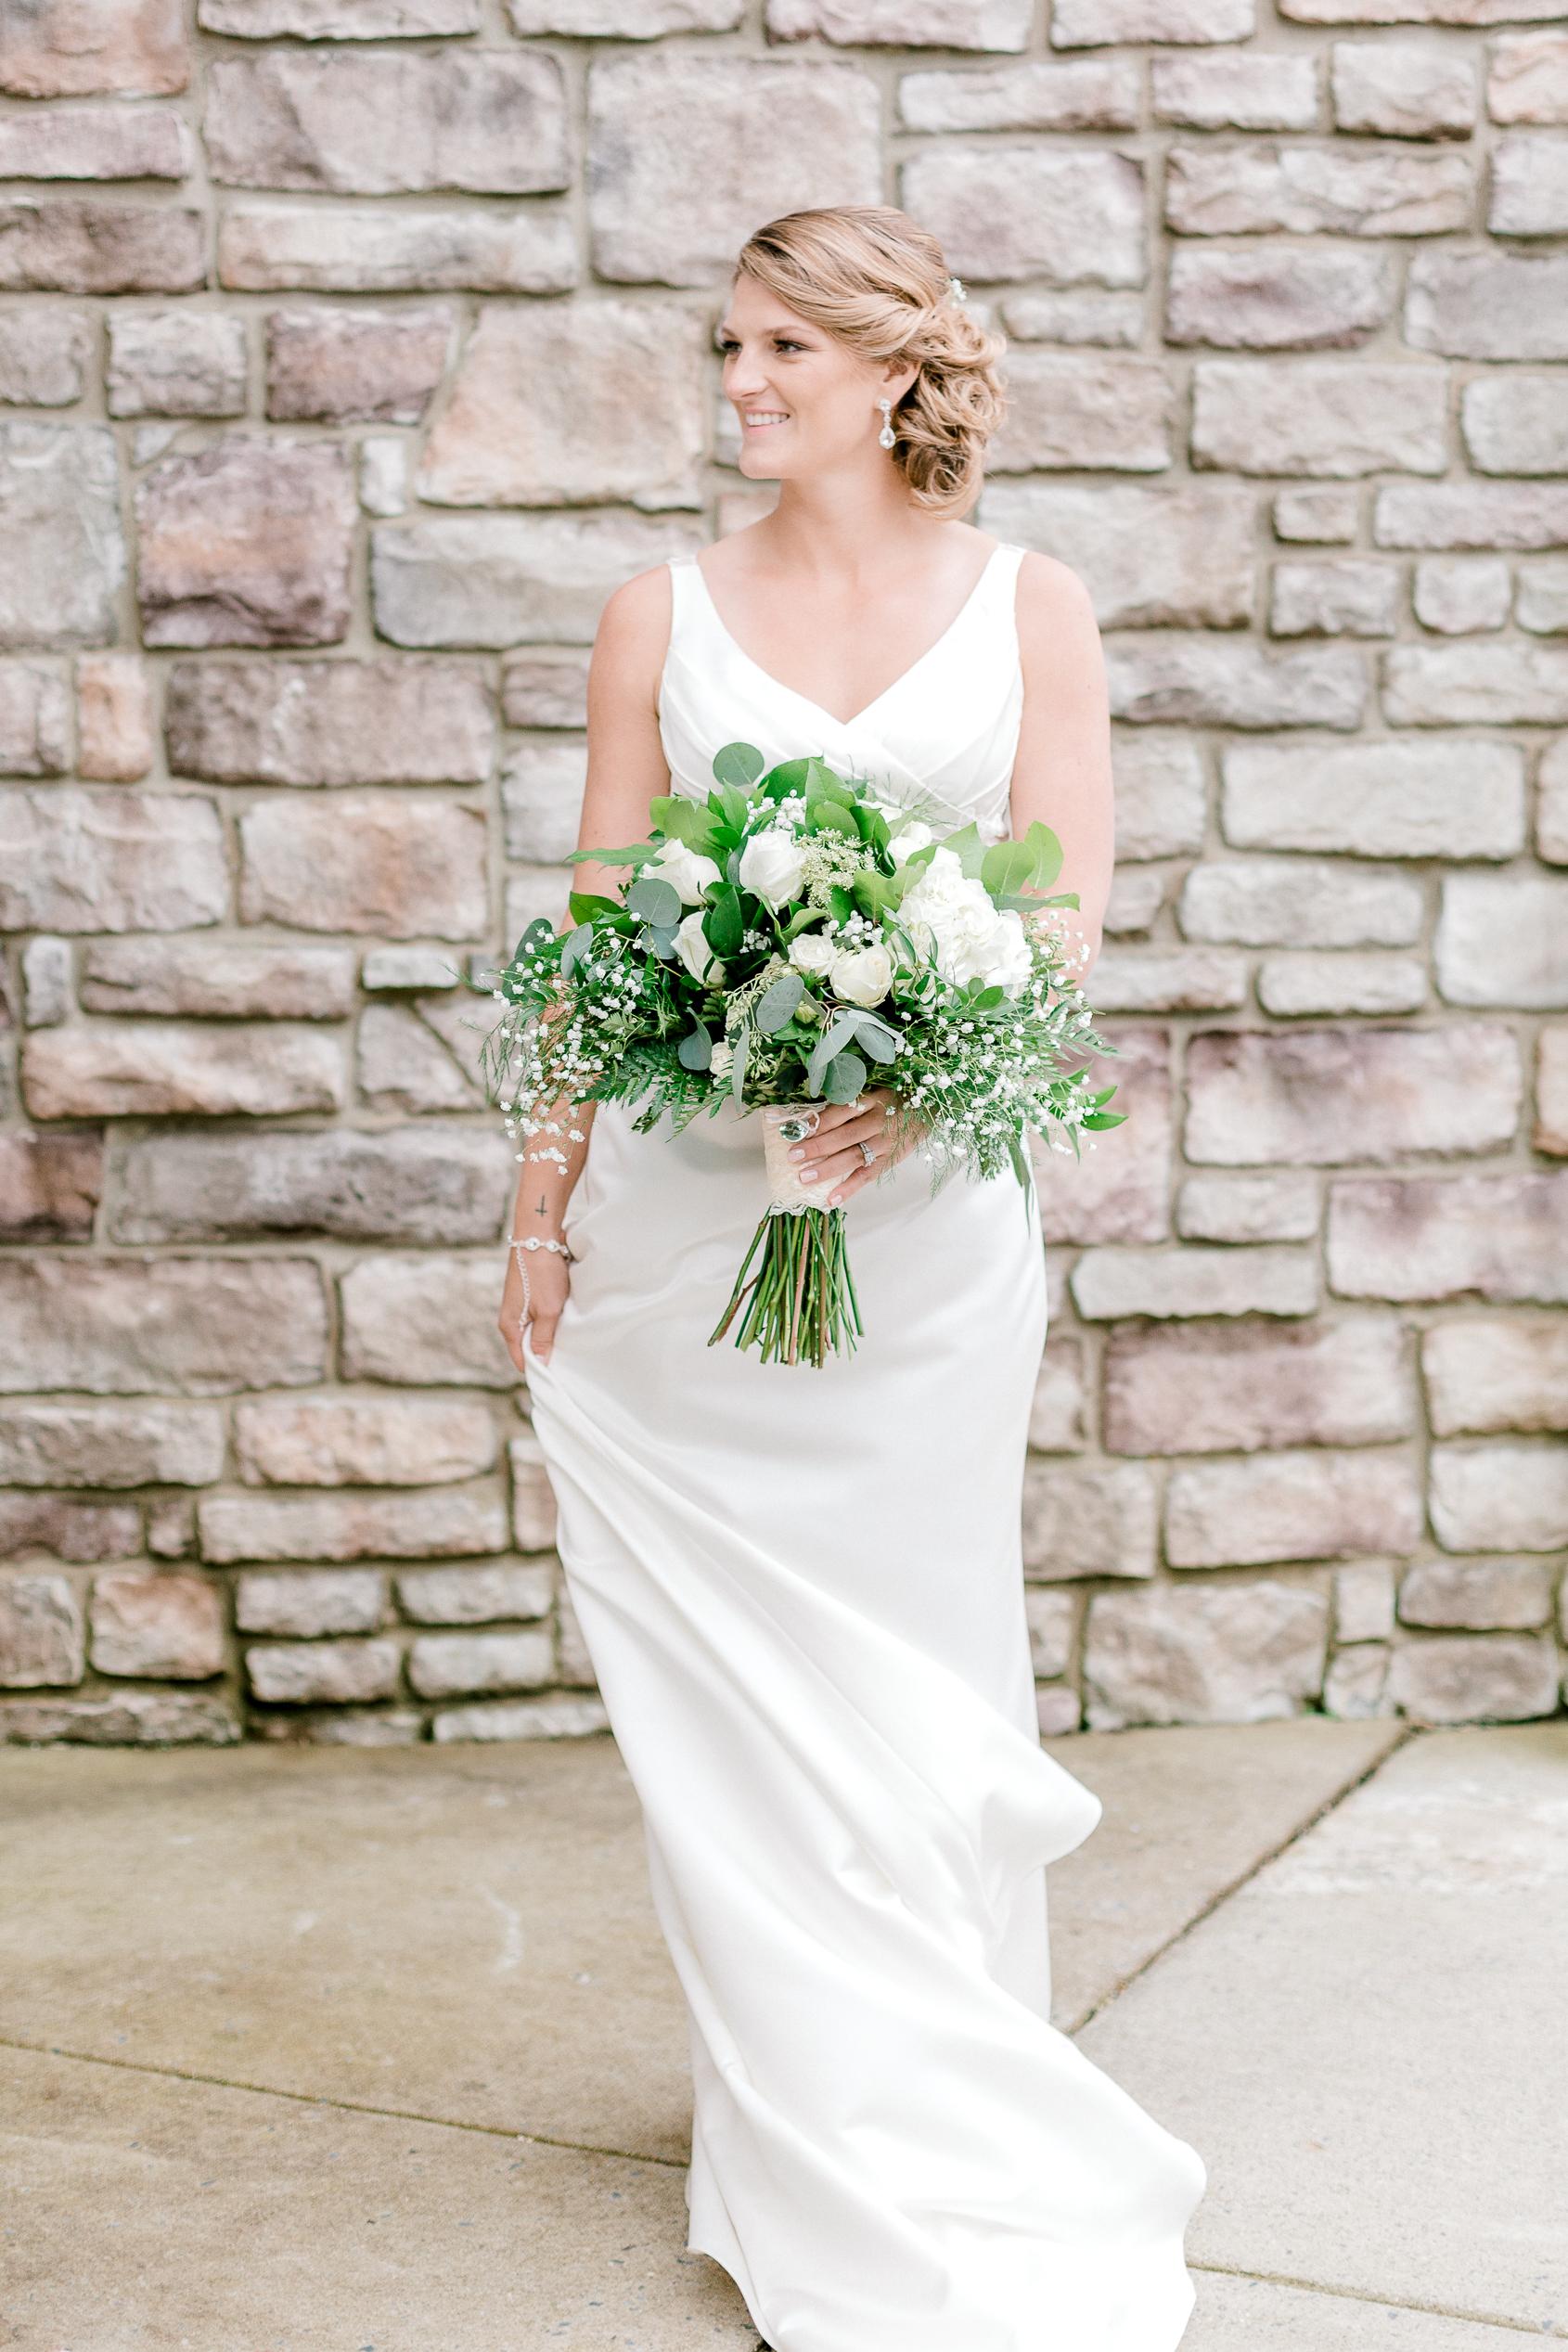 Pennsylvania October Fall Lehigh Valley wedding and lifestyle photographer Lytle Photo Co (74 of 167).jpg